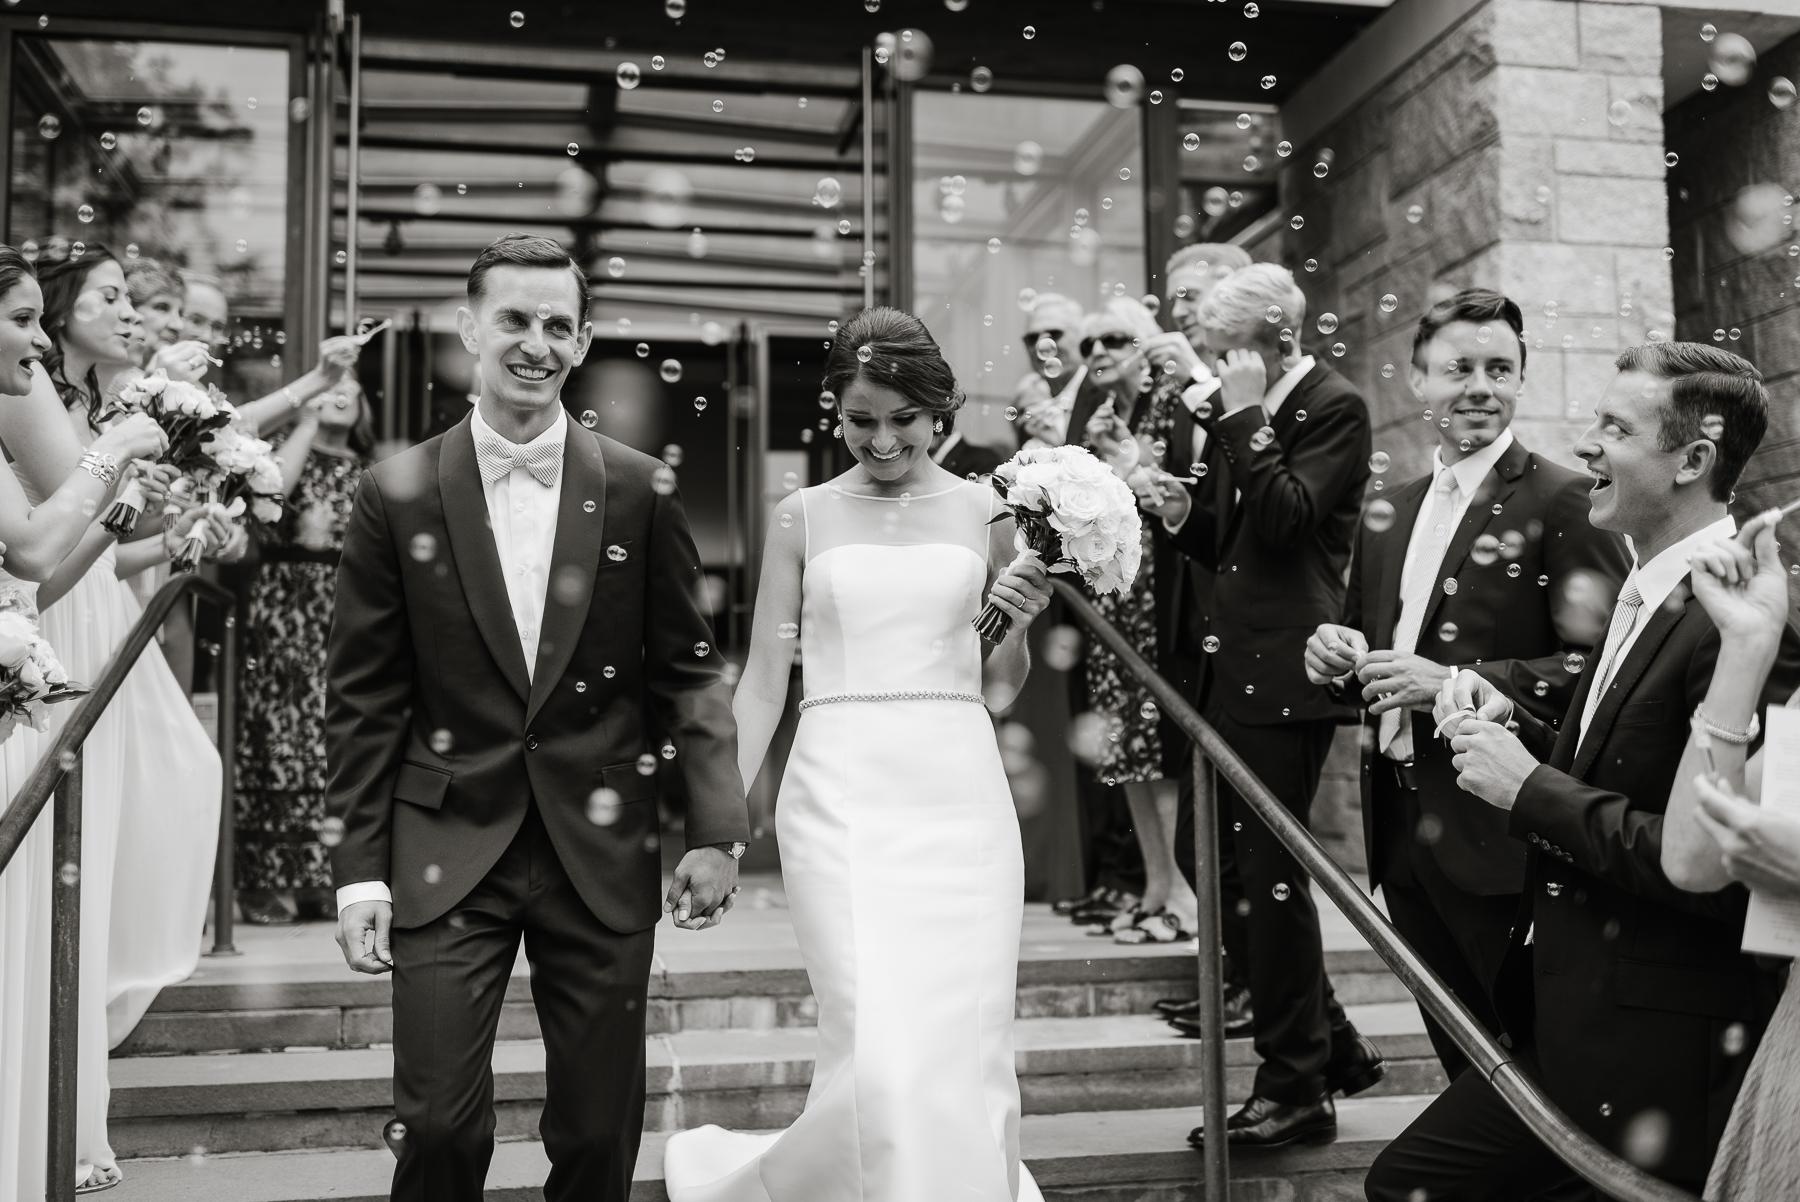 51-J Crew Wedding New Jersey Wedding Photographer J Crew Weddings.jpg